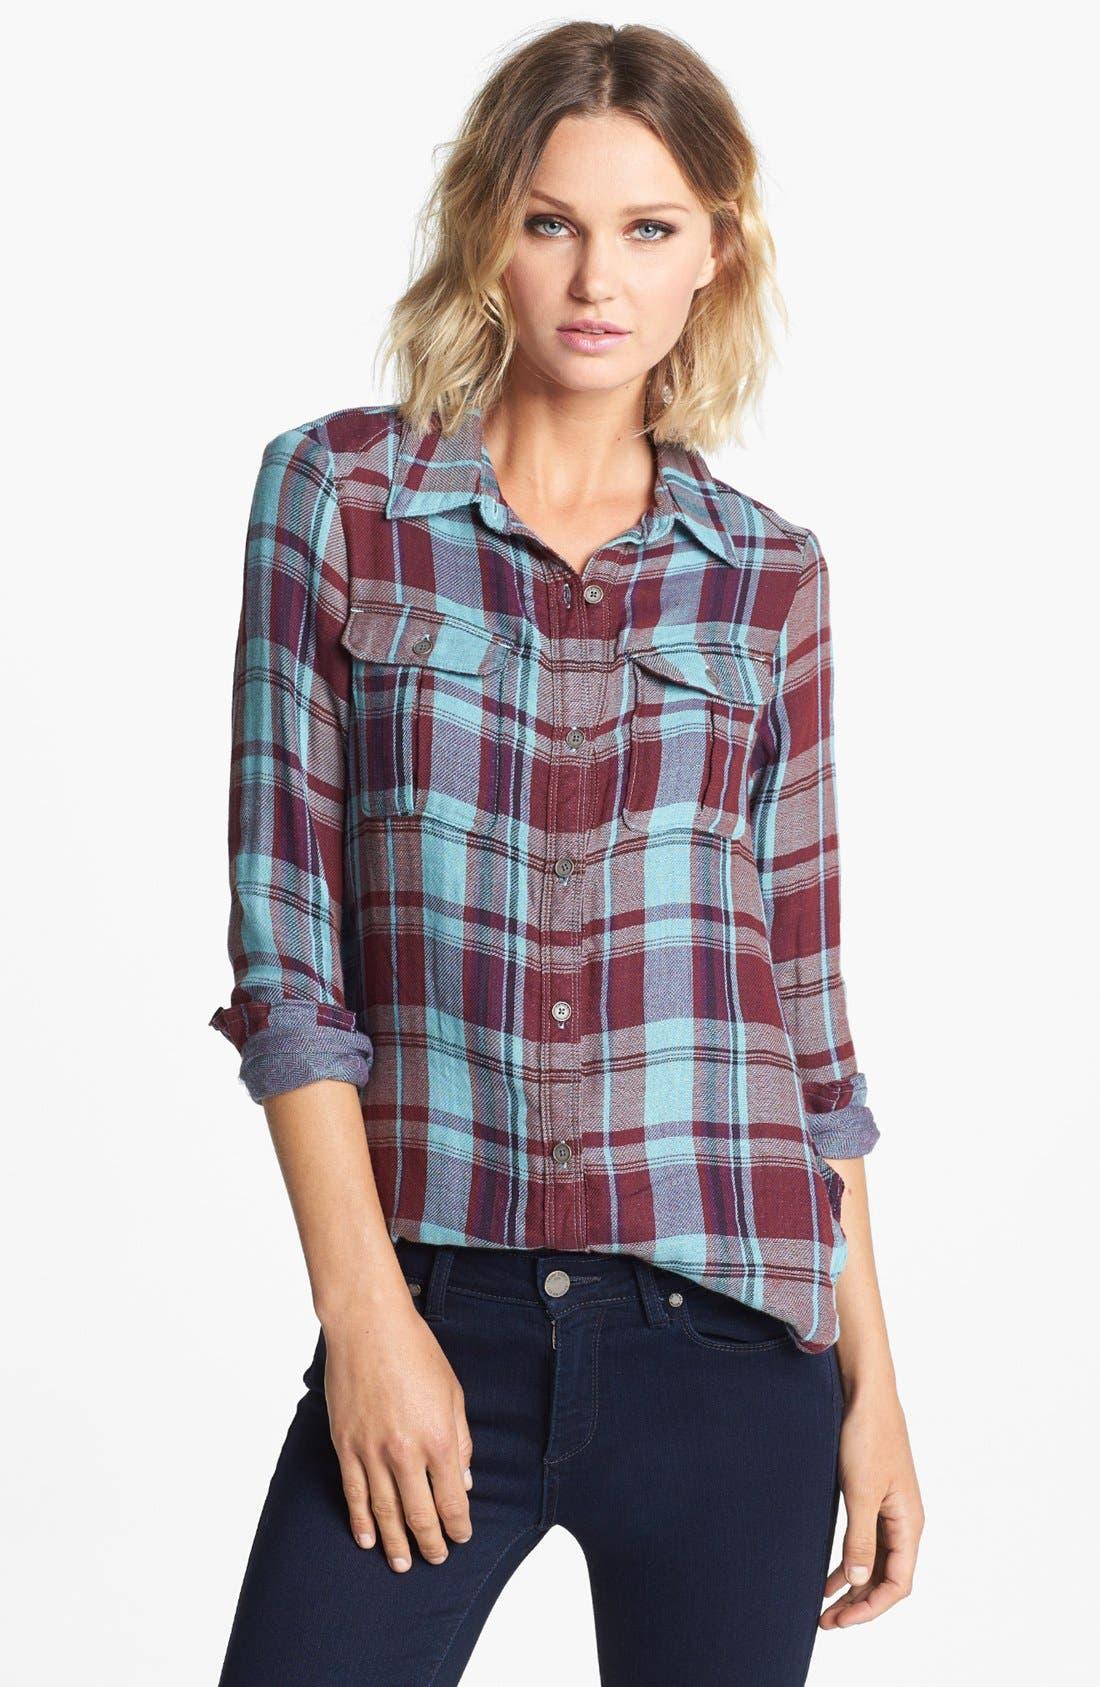 PAIGE Denim 'Kadie' Plaid Shirt, Main, color, 600